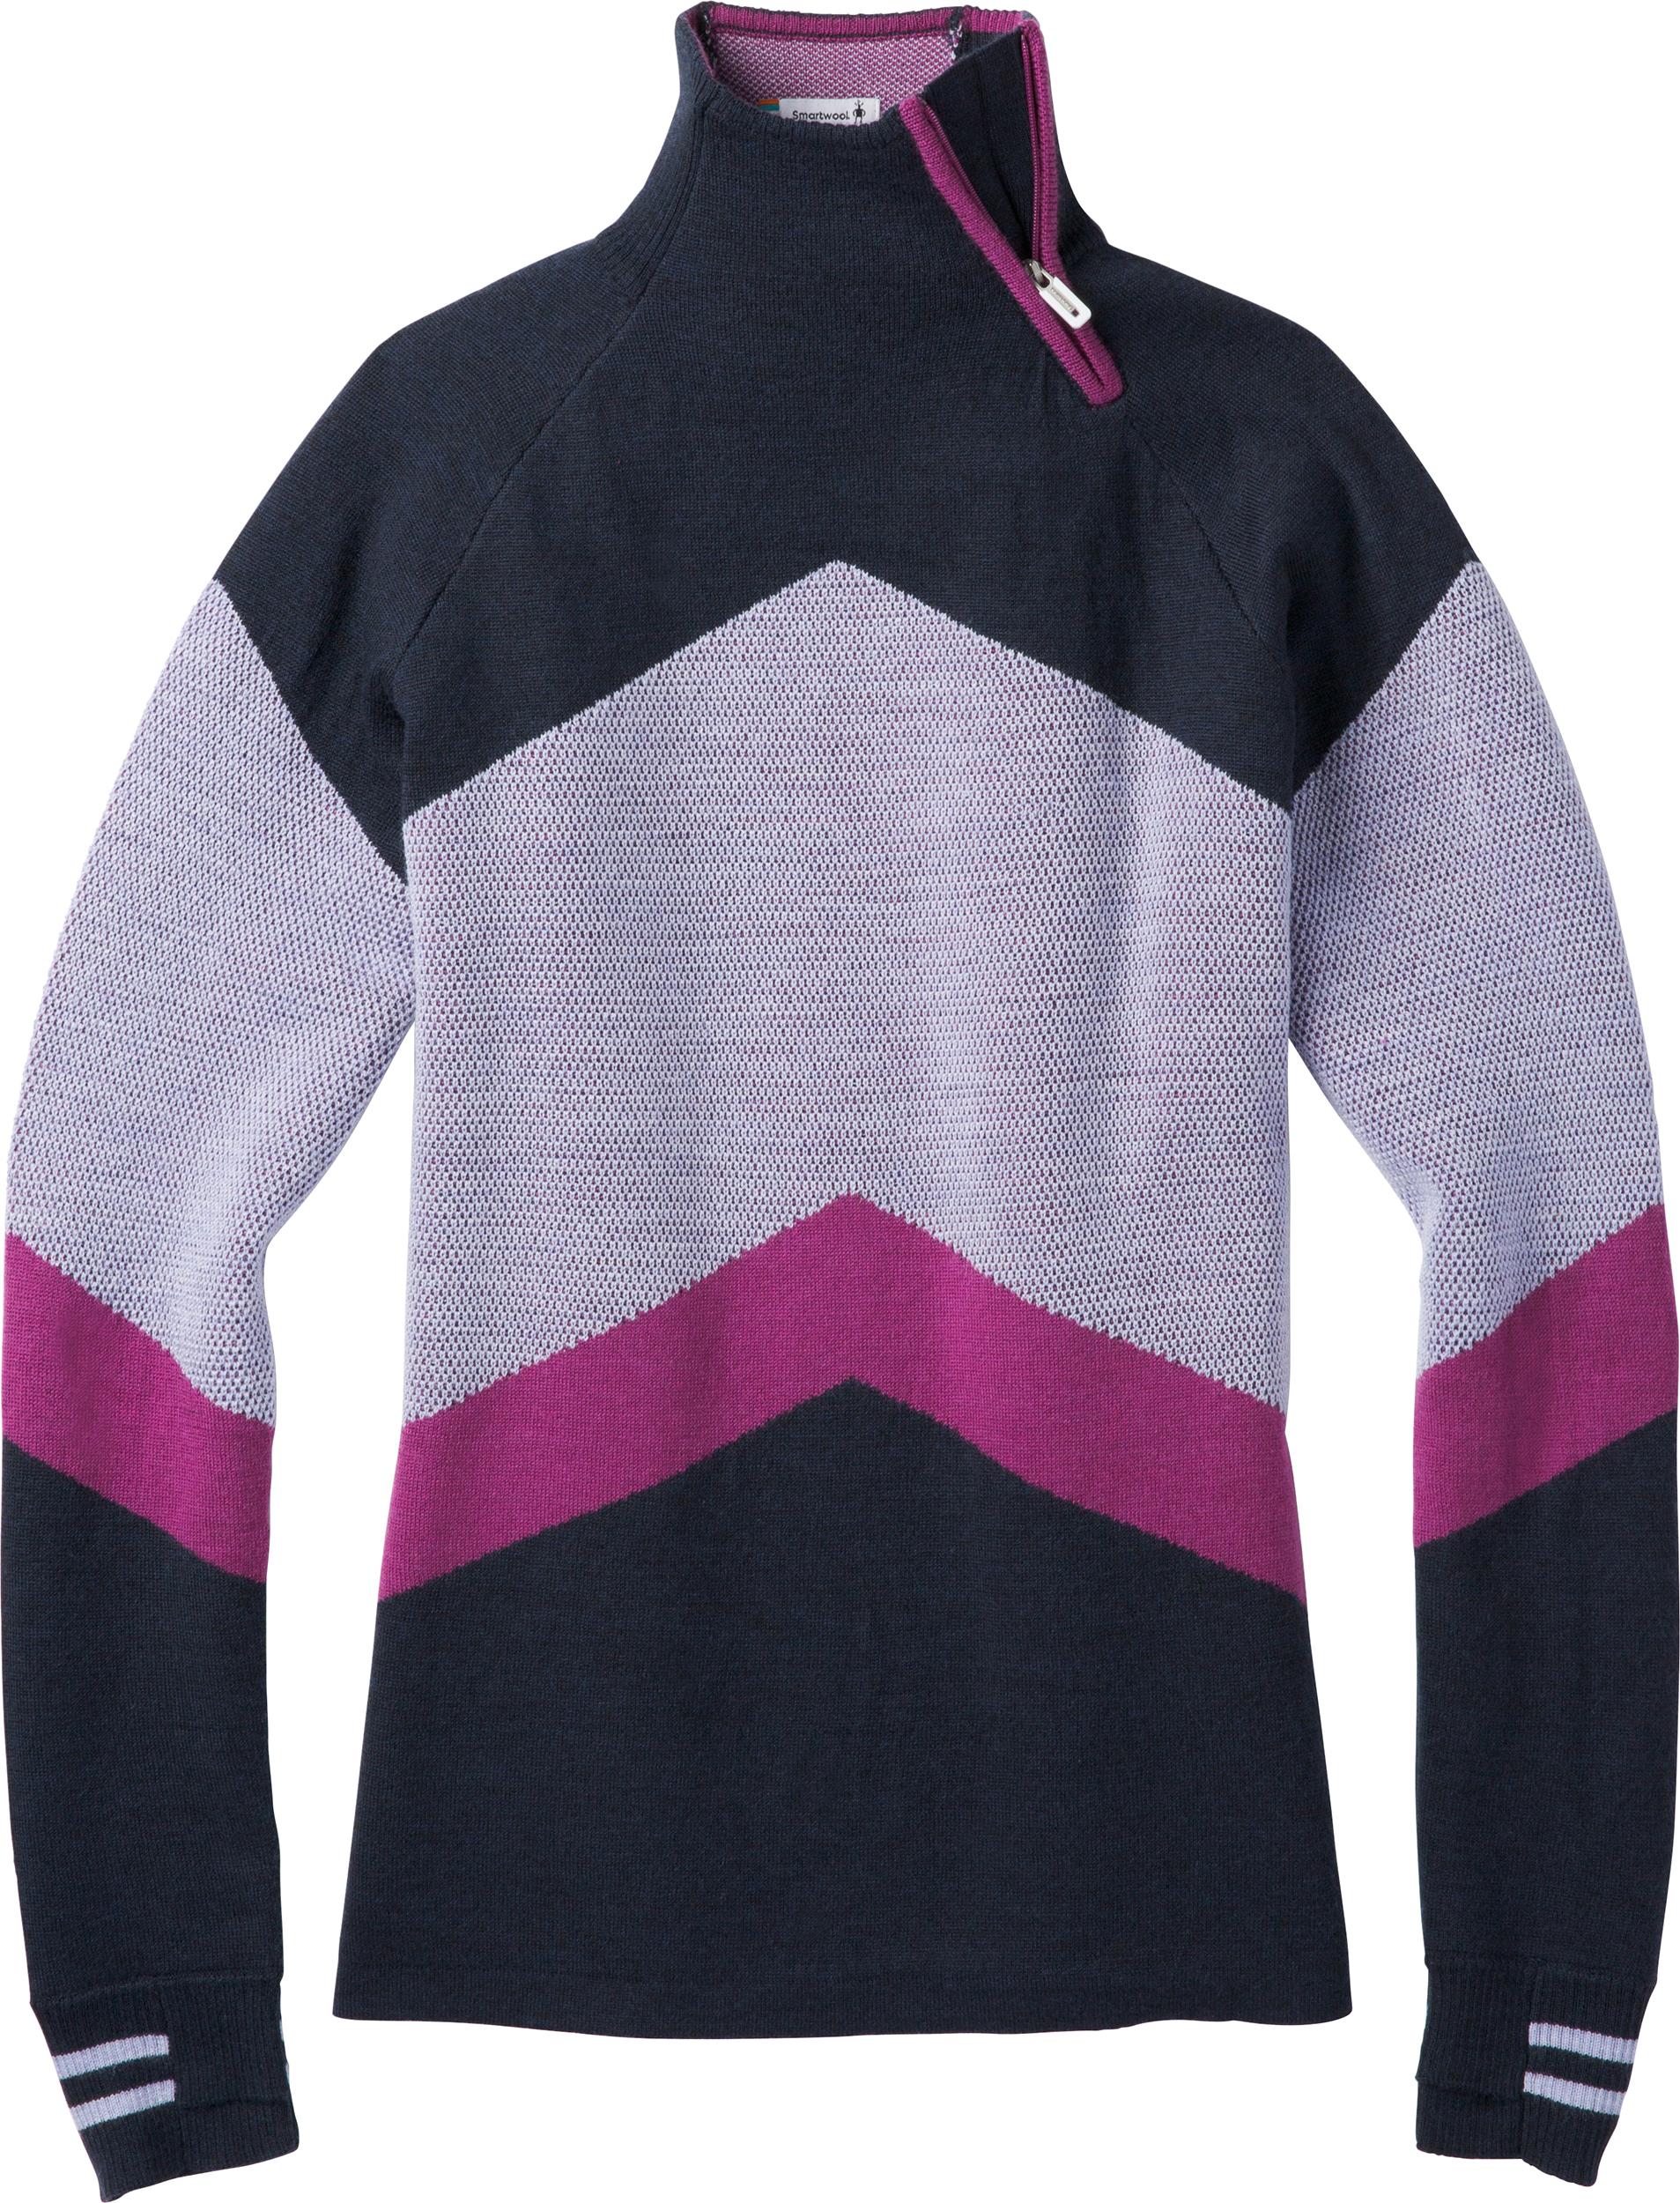 9b90f003a98a0d Smartwool Dacono Ski Funnel Neck Sweater - Women's | MEC